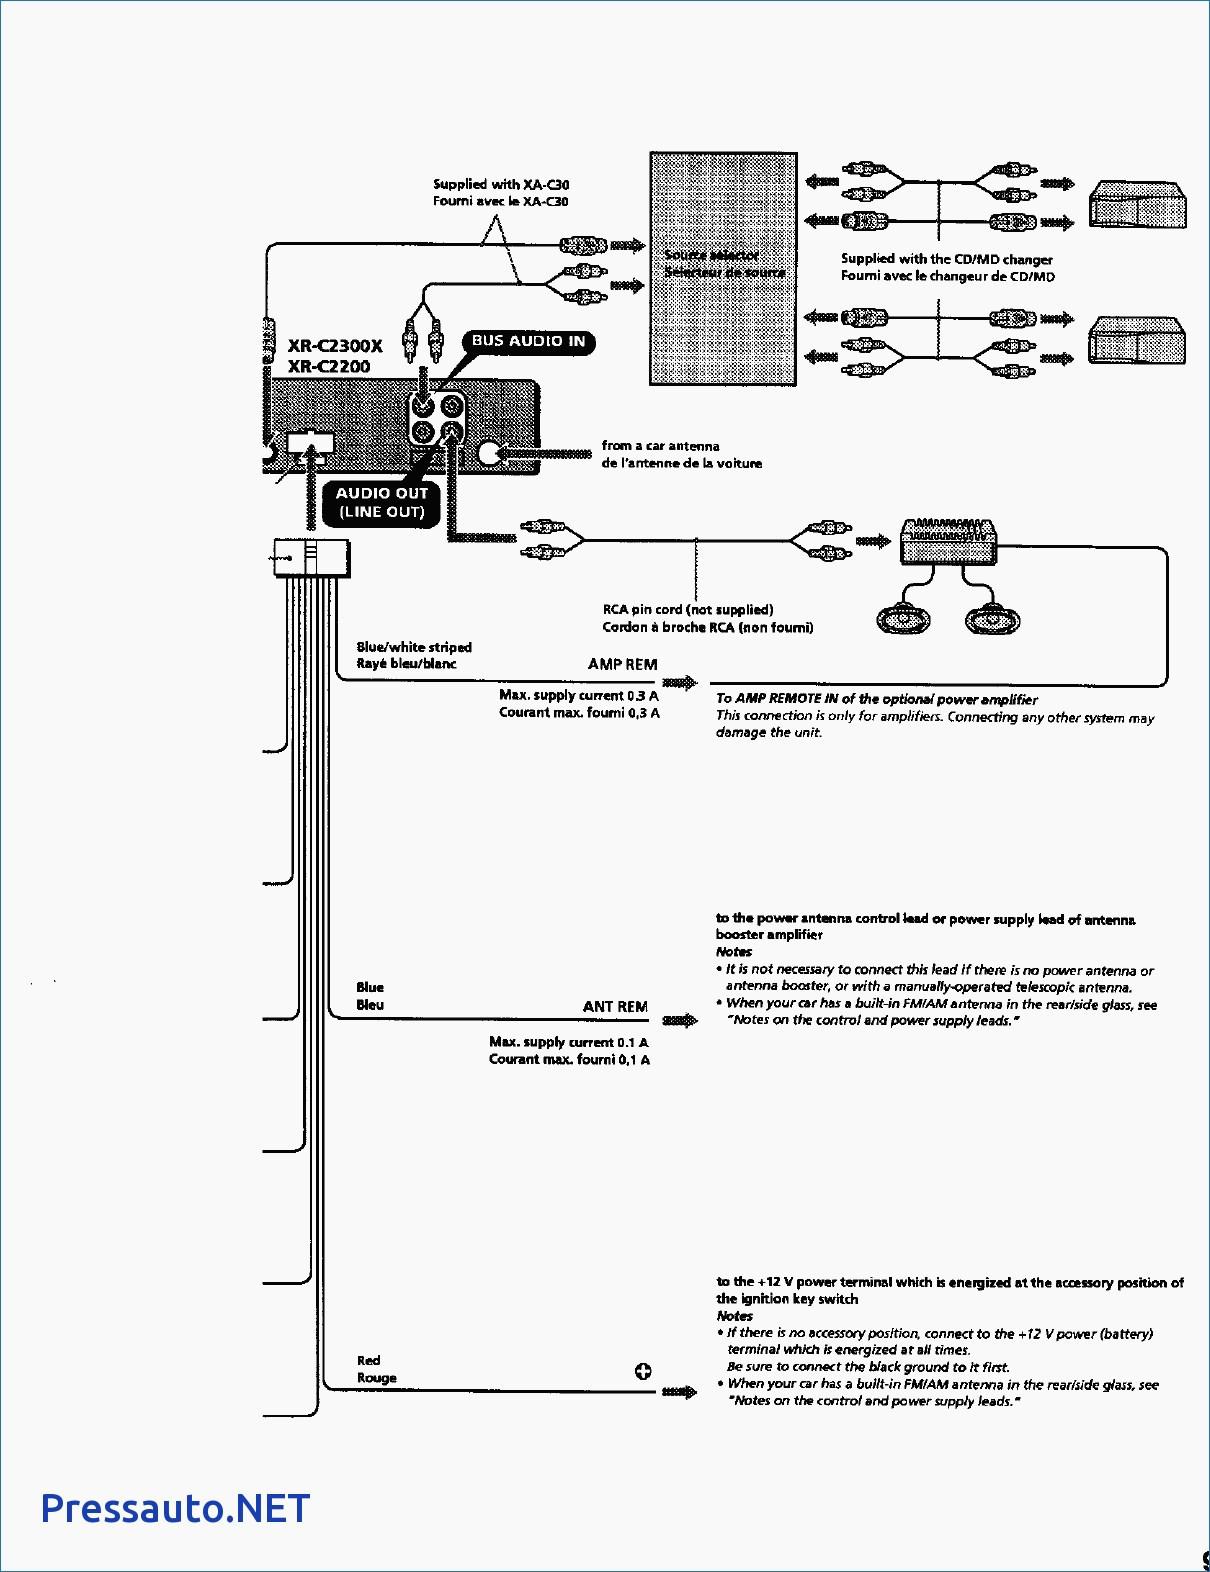 sony xplod cdx gt35uw wiring diagram wrg 9867 258 cj7 fuse box wire hight resolution of wiring cdx sony for diagram faceplate xplod gt10w wiring diagramsony cdx gt06 wiring